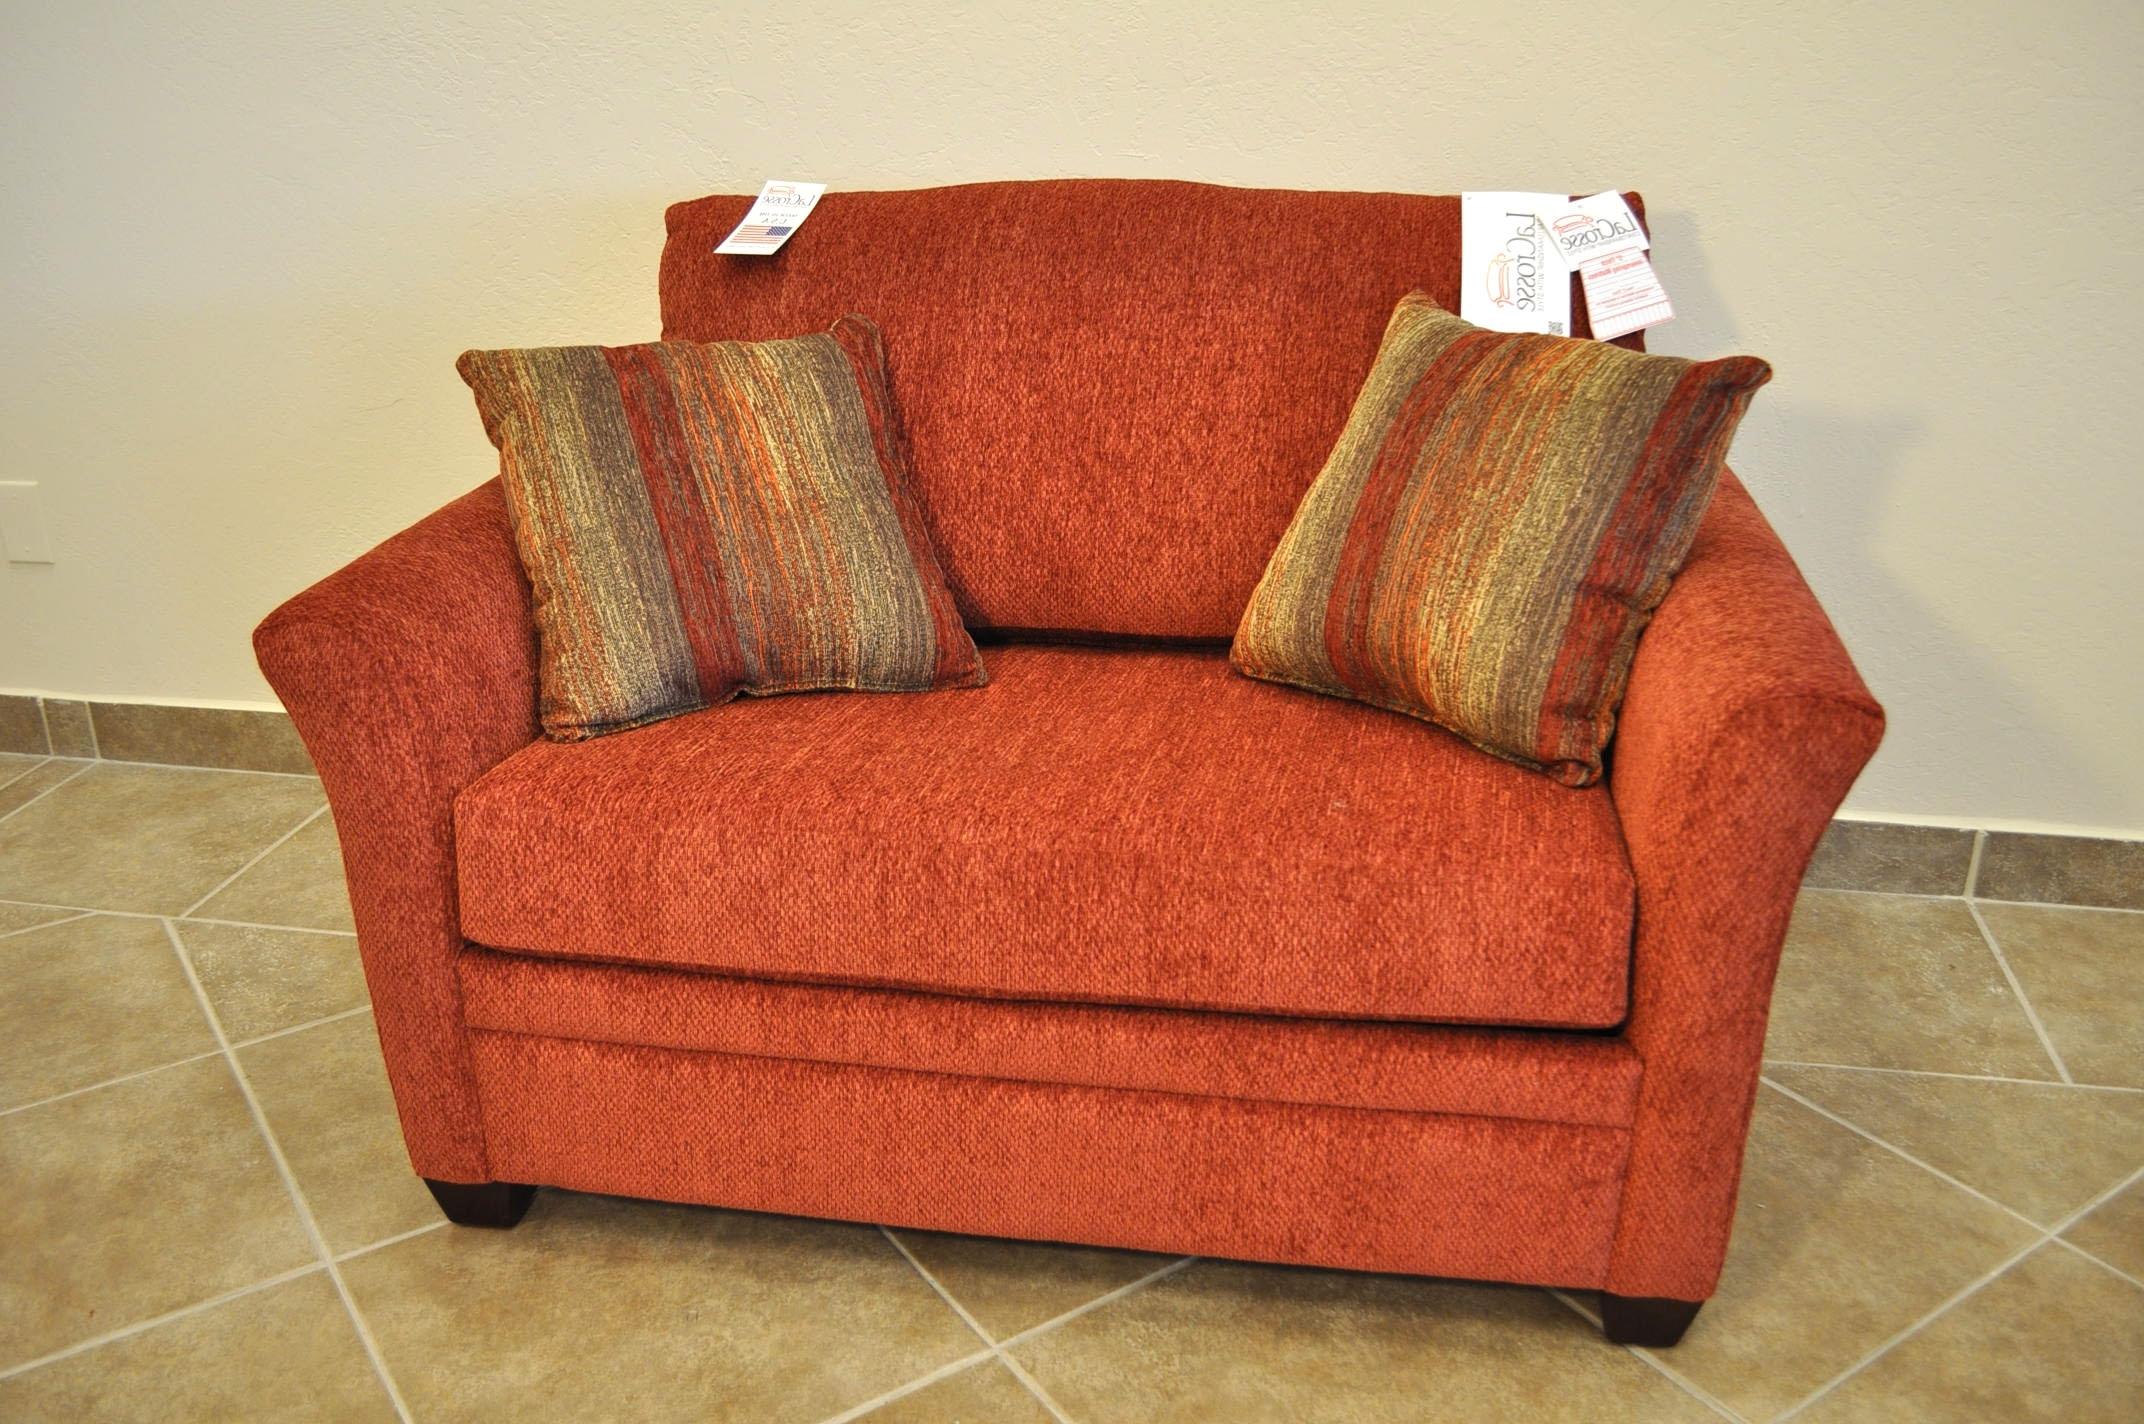 Furniture : 5 Sleeper Sofa Mattress Sleeper Sofa Vs Futon Mattress Inside Famous Everett Wa Sectional Sofas (View 11 of 20)